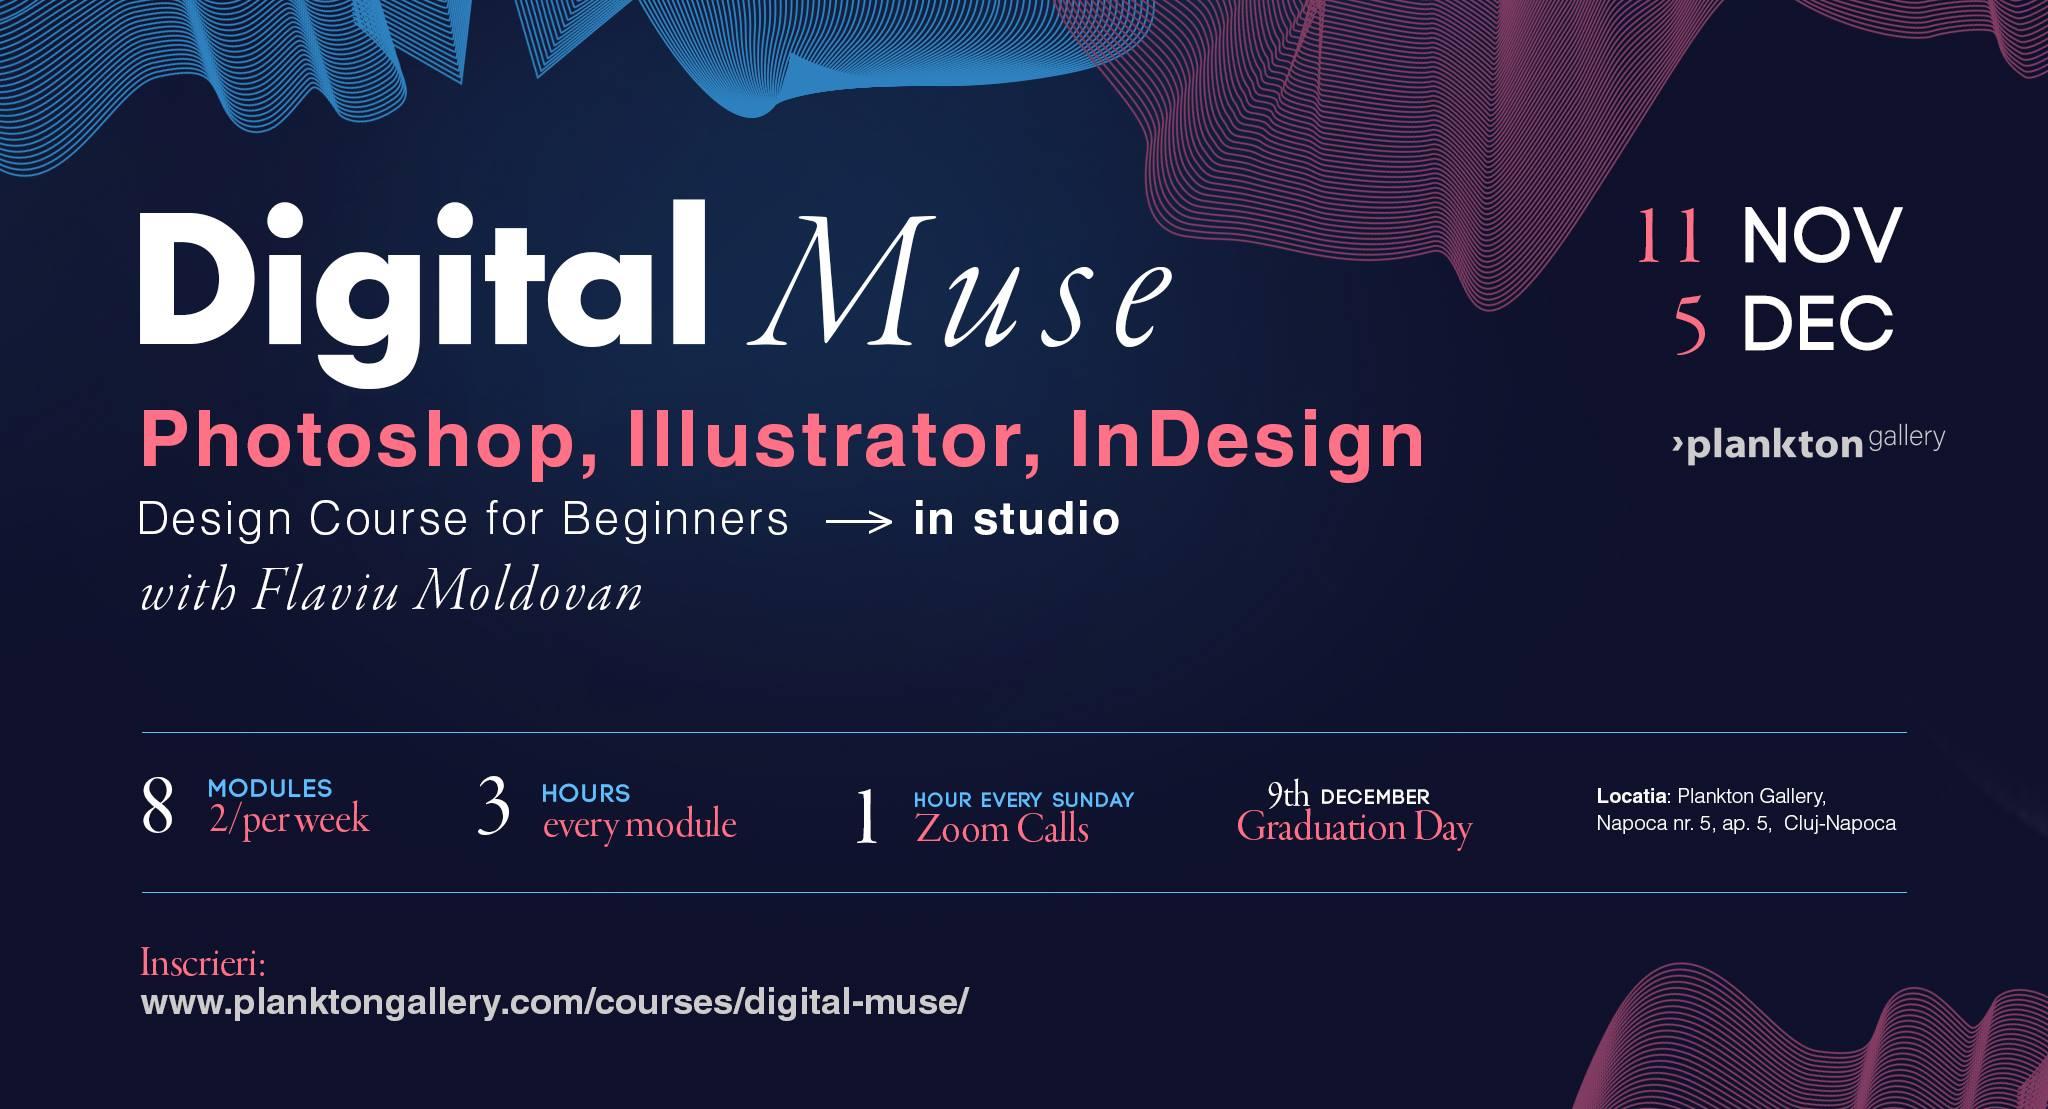 Digital Muse – Photoshop, Illustrator, InDesign – Design Course